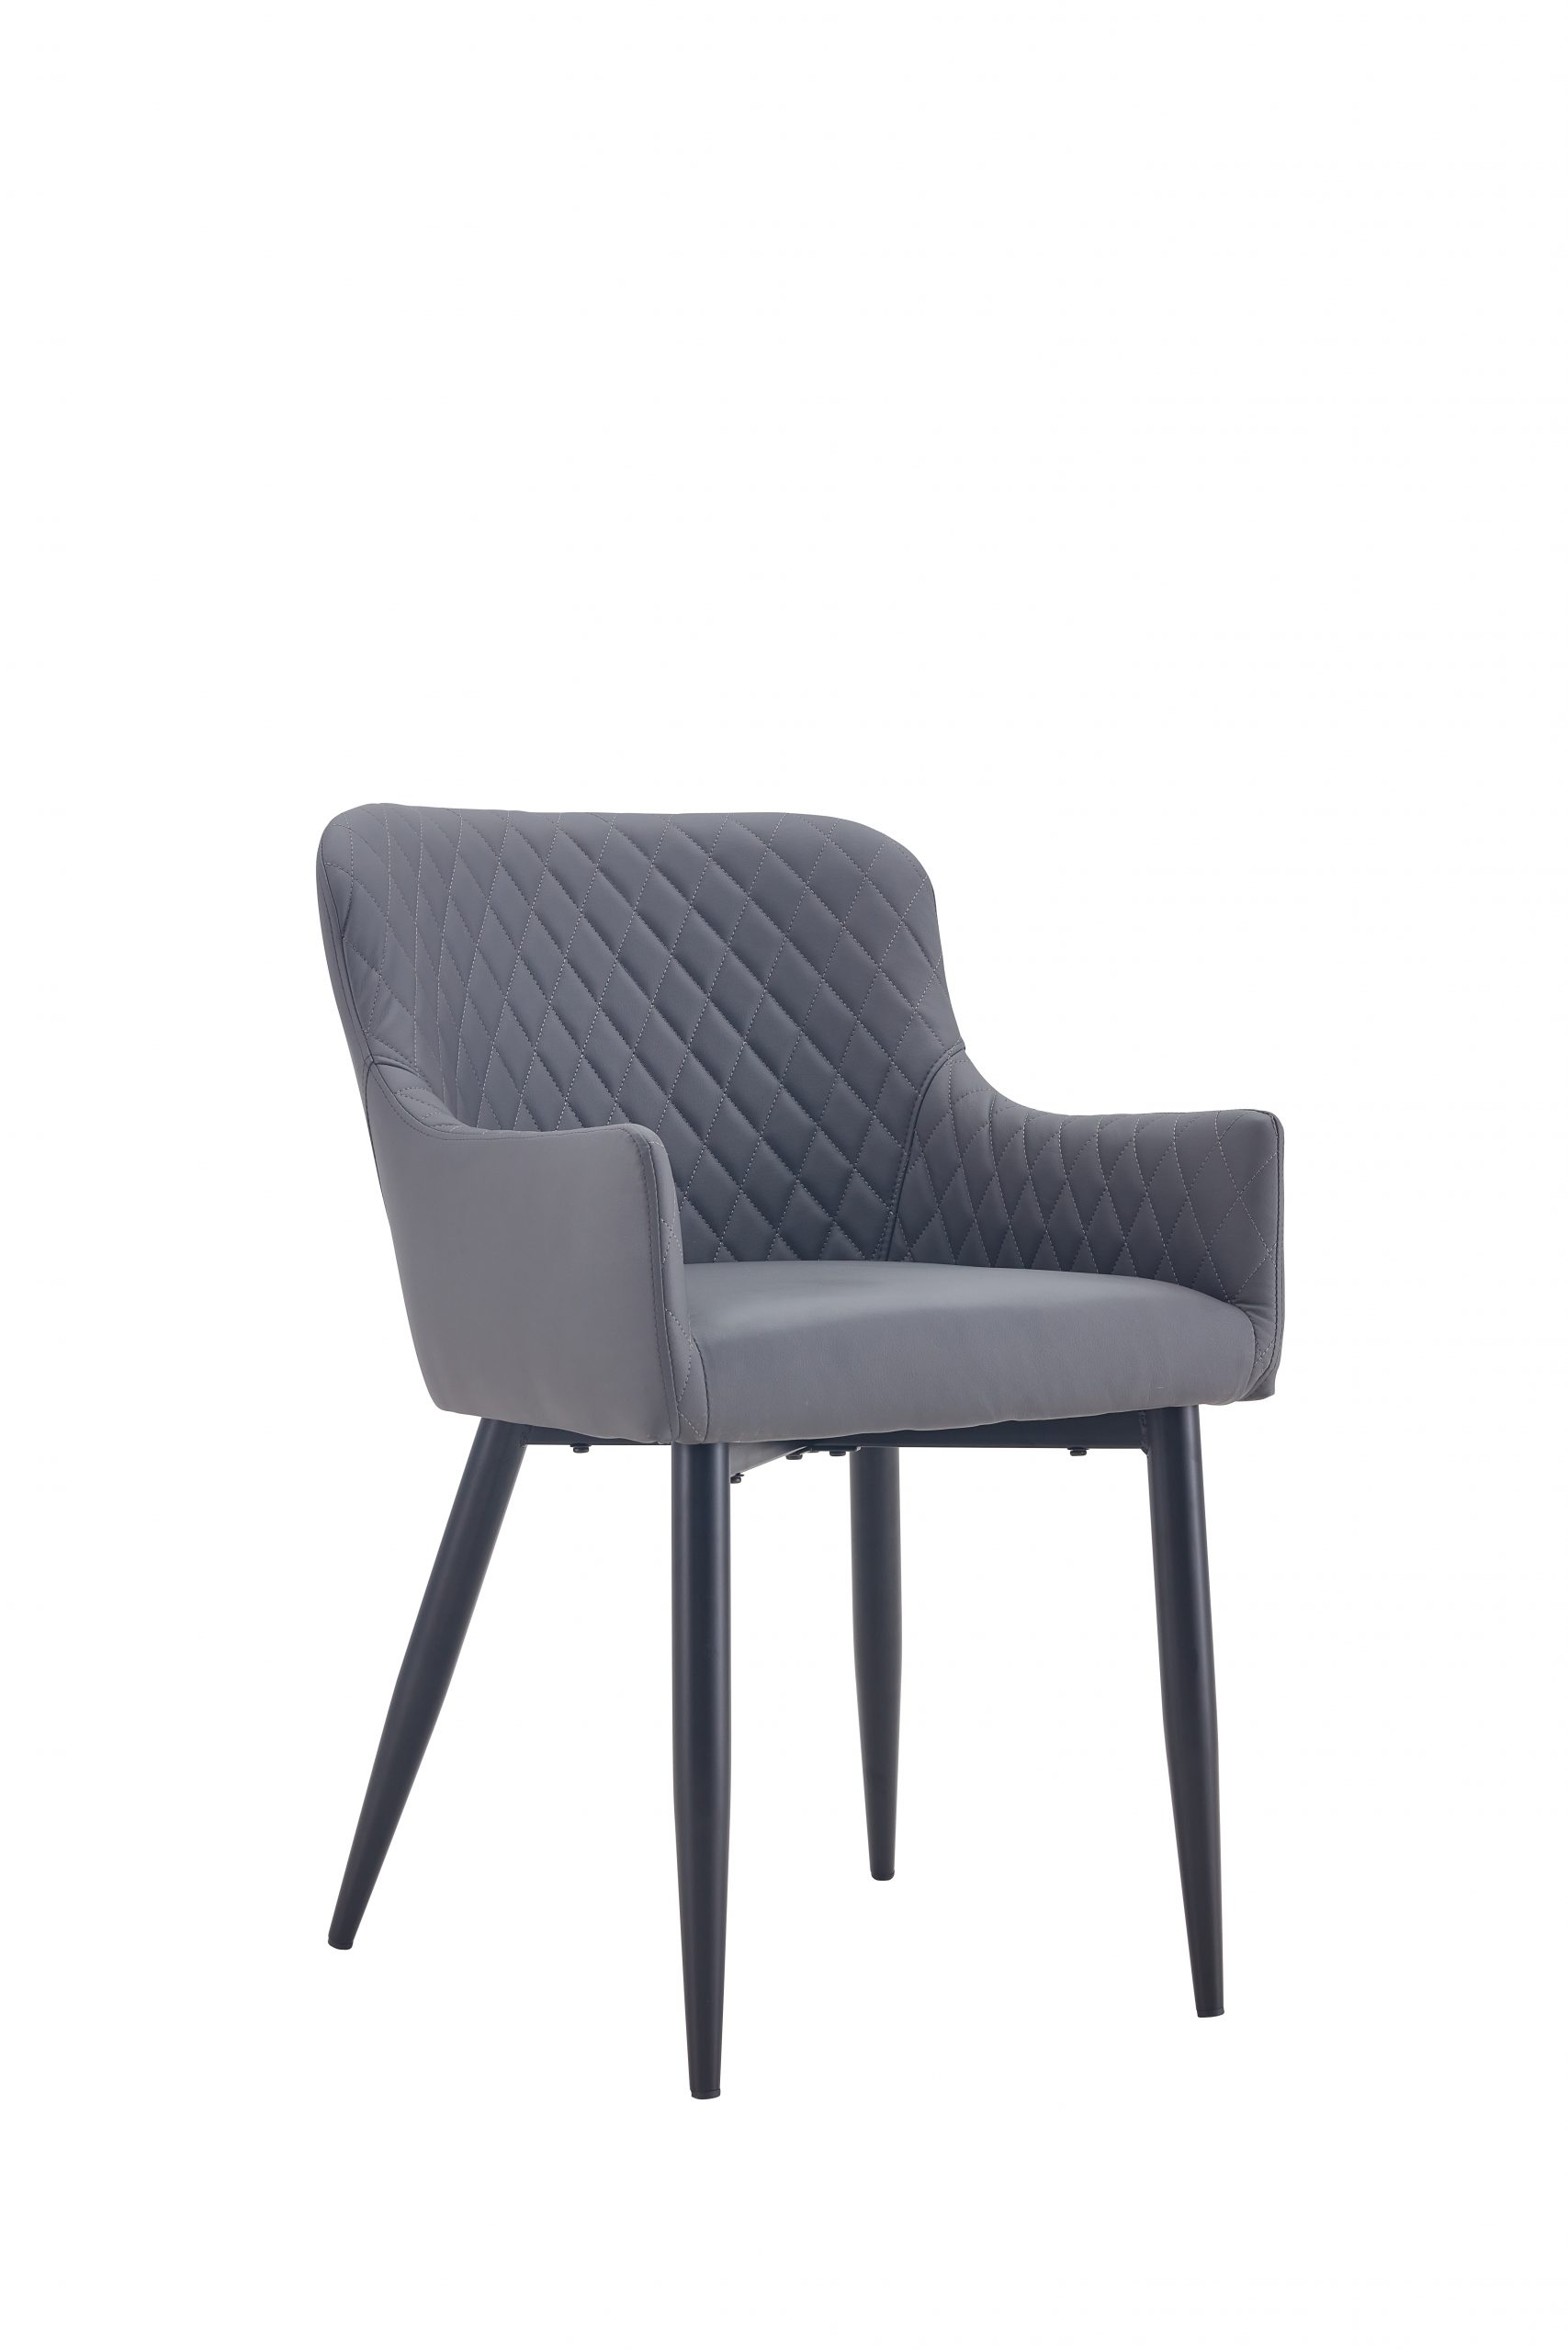 Newport High Arm Chairs